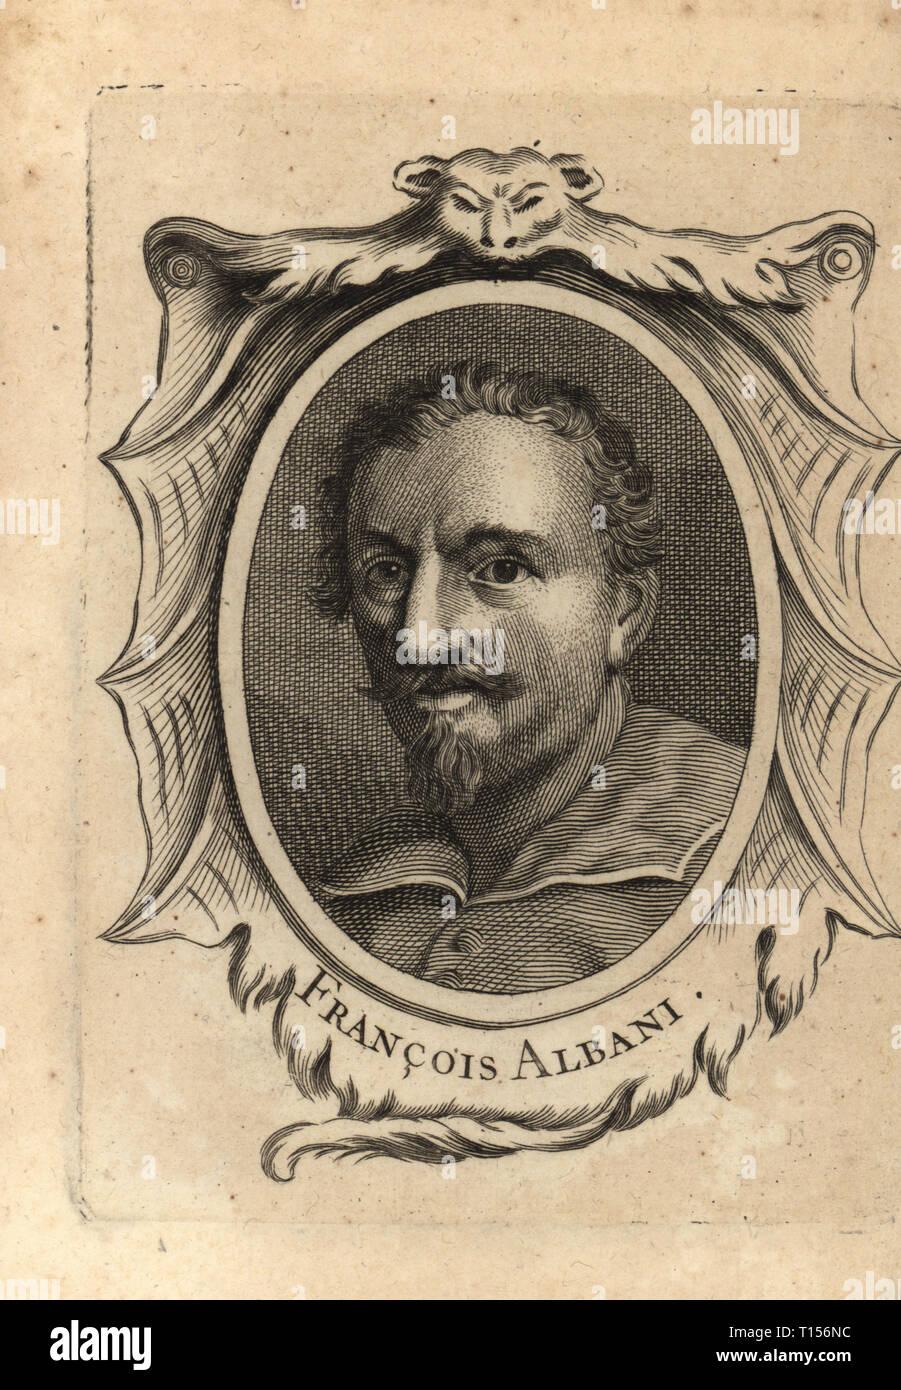 Andrea Albani francesco albani stock photos & francesco albani stock